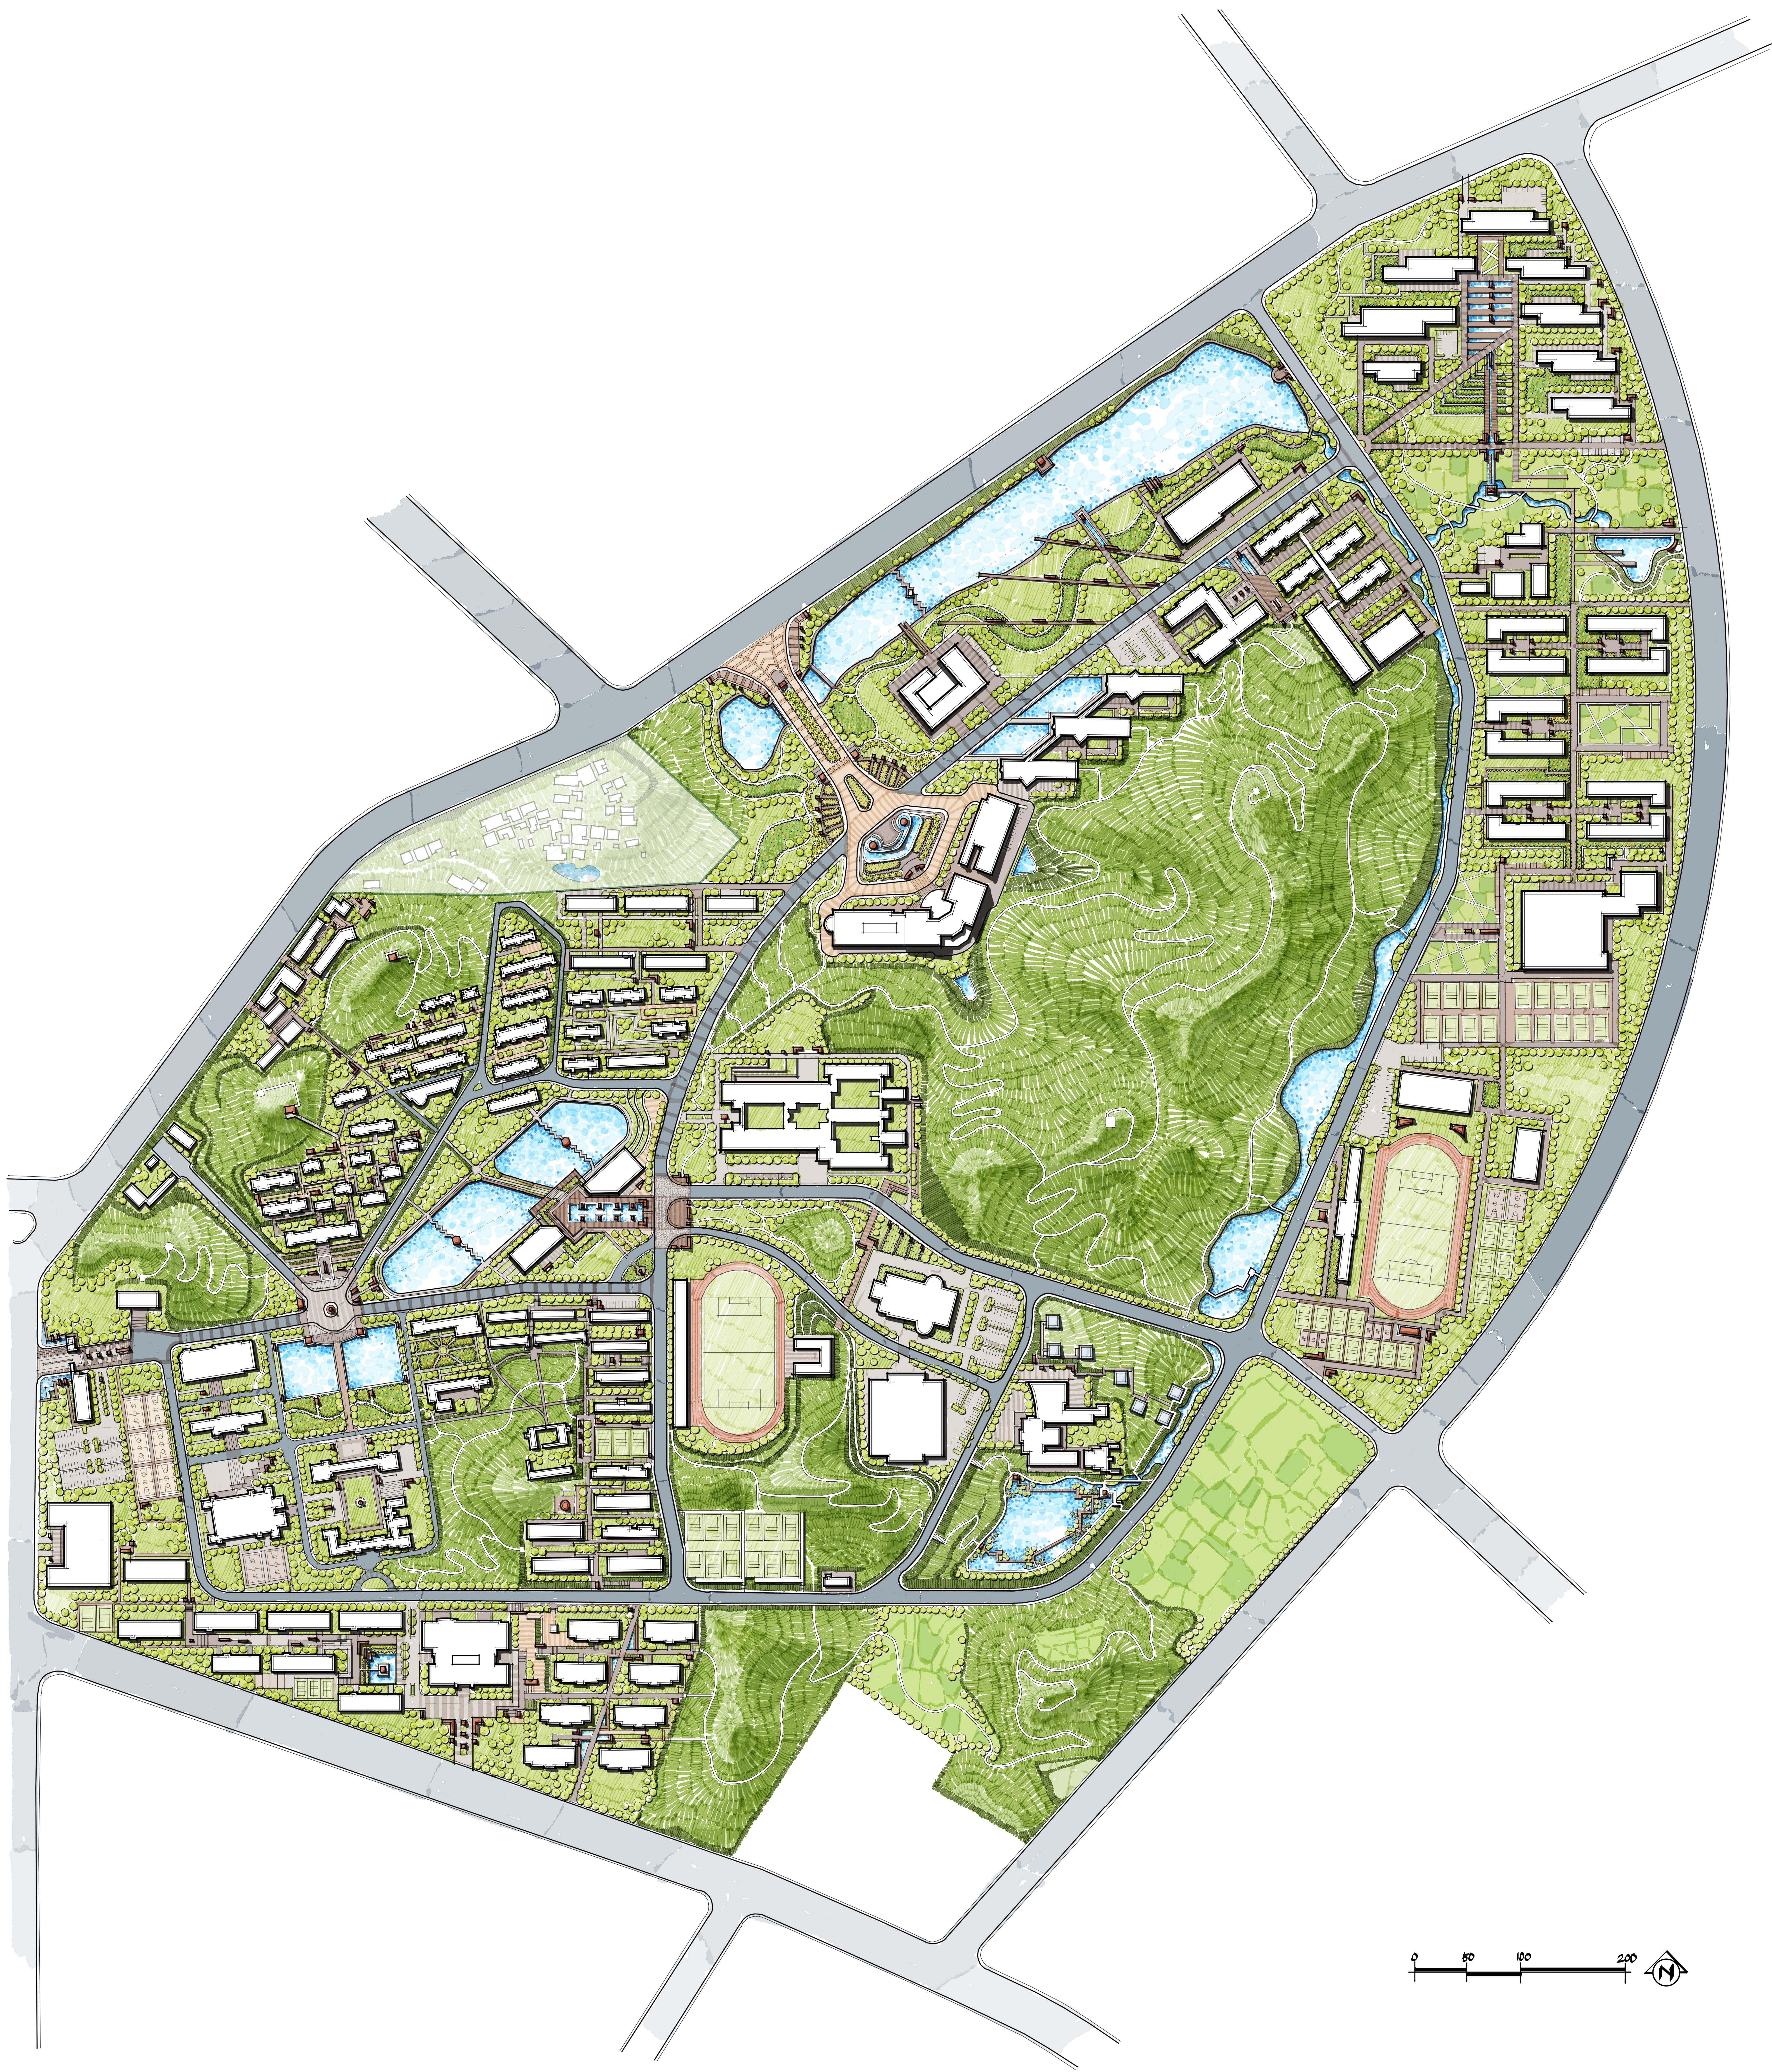 University Landscape Master Plan School Master Plan Green Reserve Freehand Landscape Master Plan China School Master Plan Plan Sketch Concept Architecture